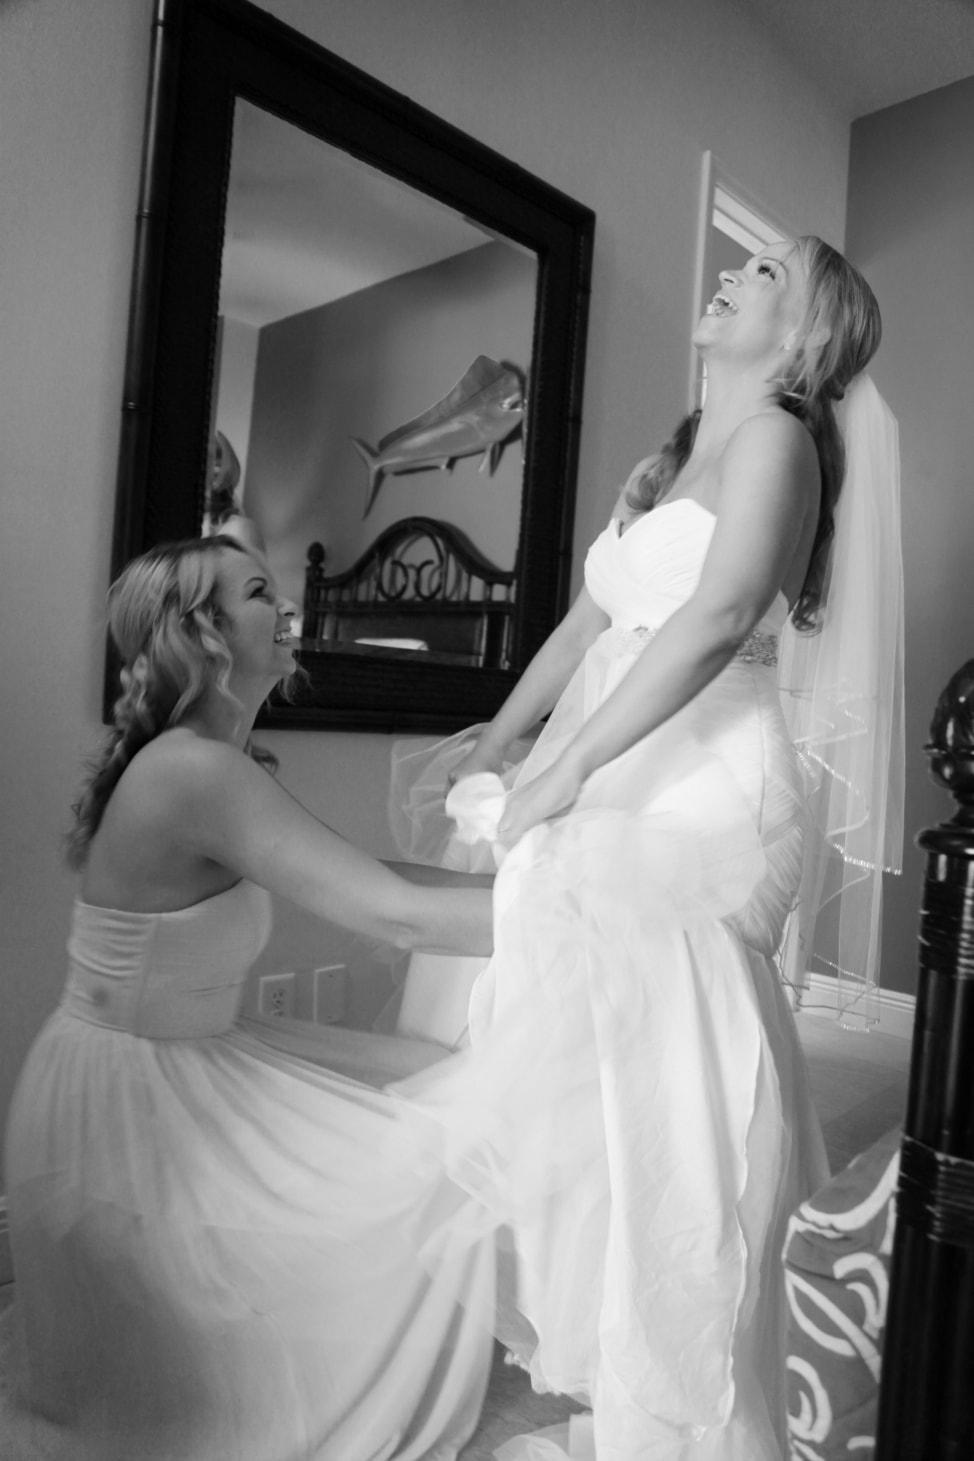 angie-away-new-normoyle-destination-wedding-1-min